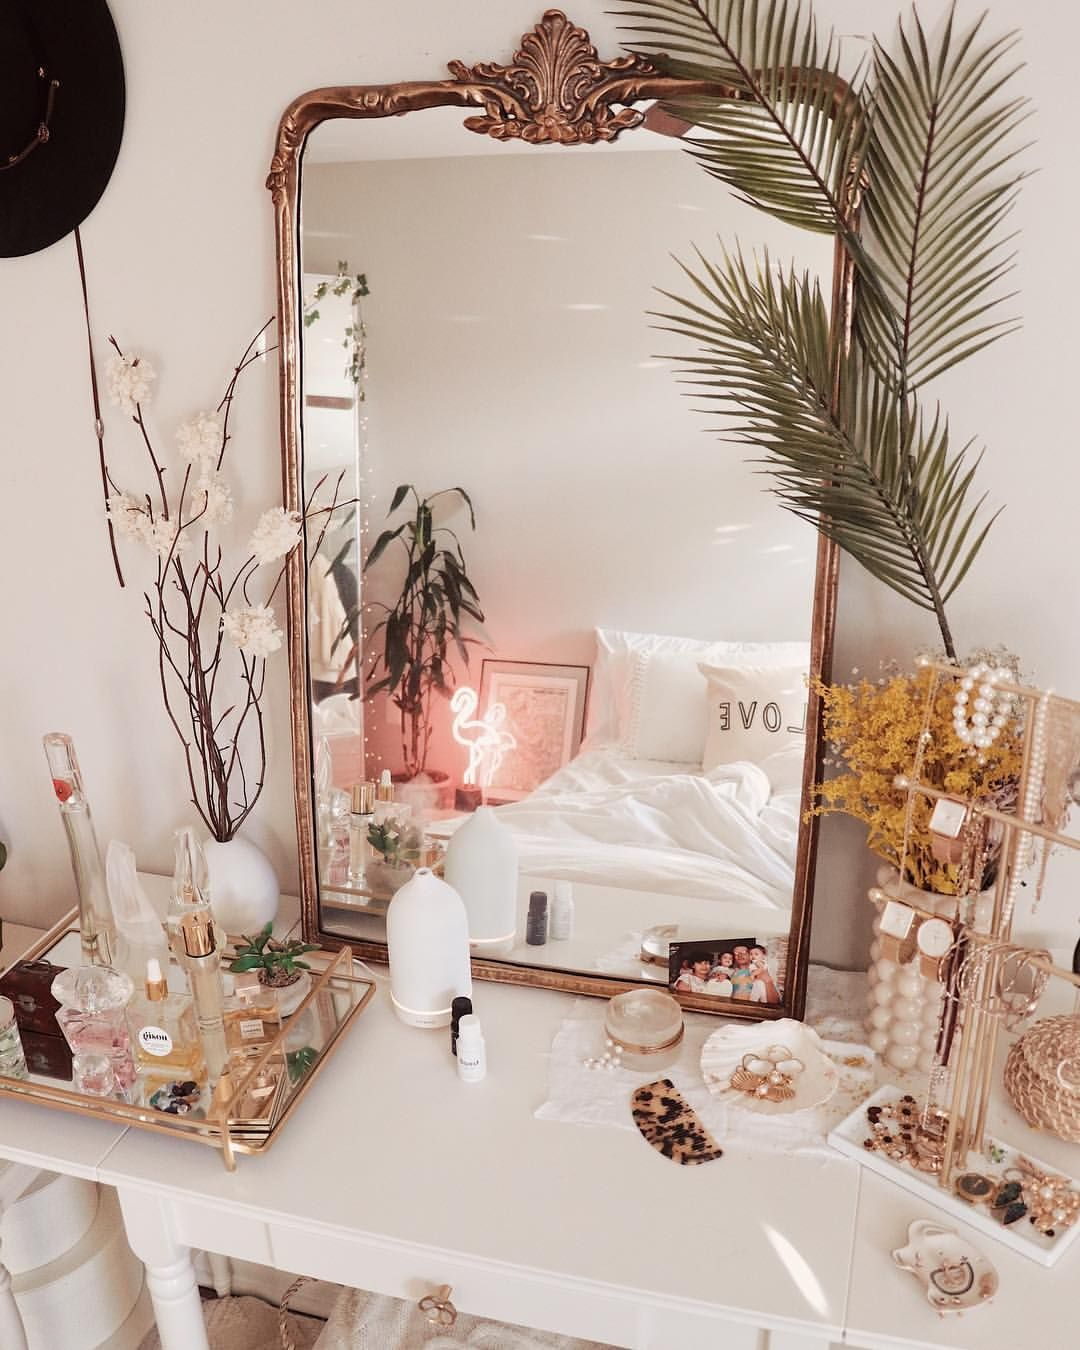 "Celeste Escarcega on Instagram: ""Morning Essentials ️ @vitruvi . . . . . . . . . #vitruvi #essentialoils #apartmenttherapy #homedecorating #vanitymirror #anthropologie…"""